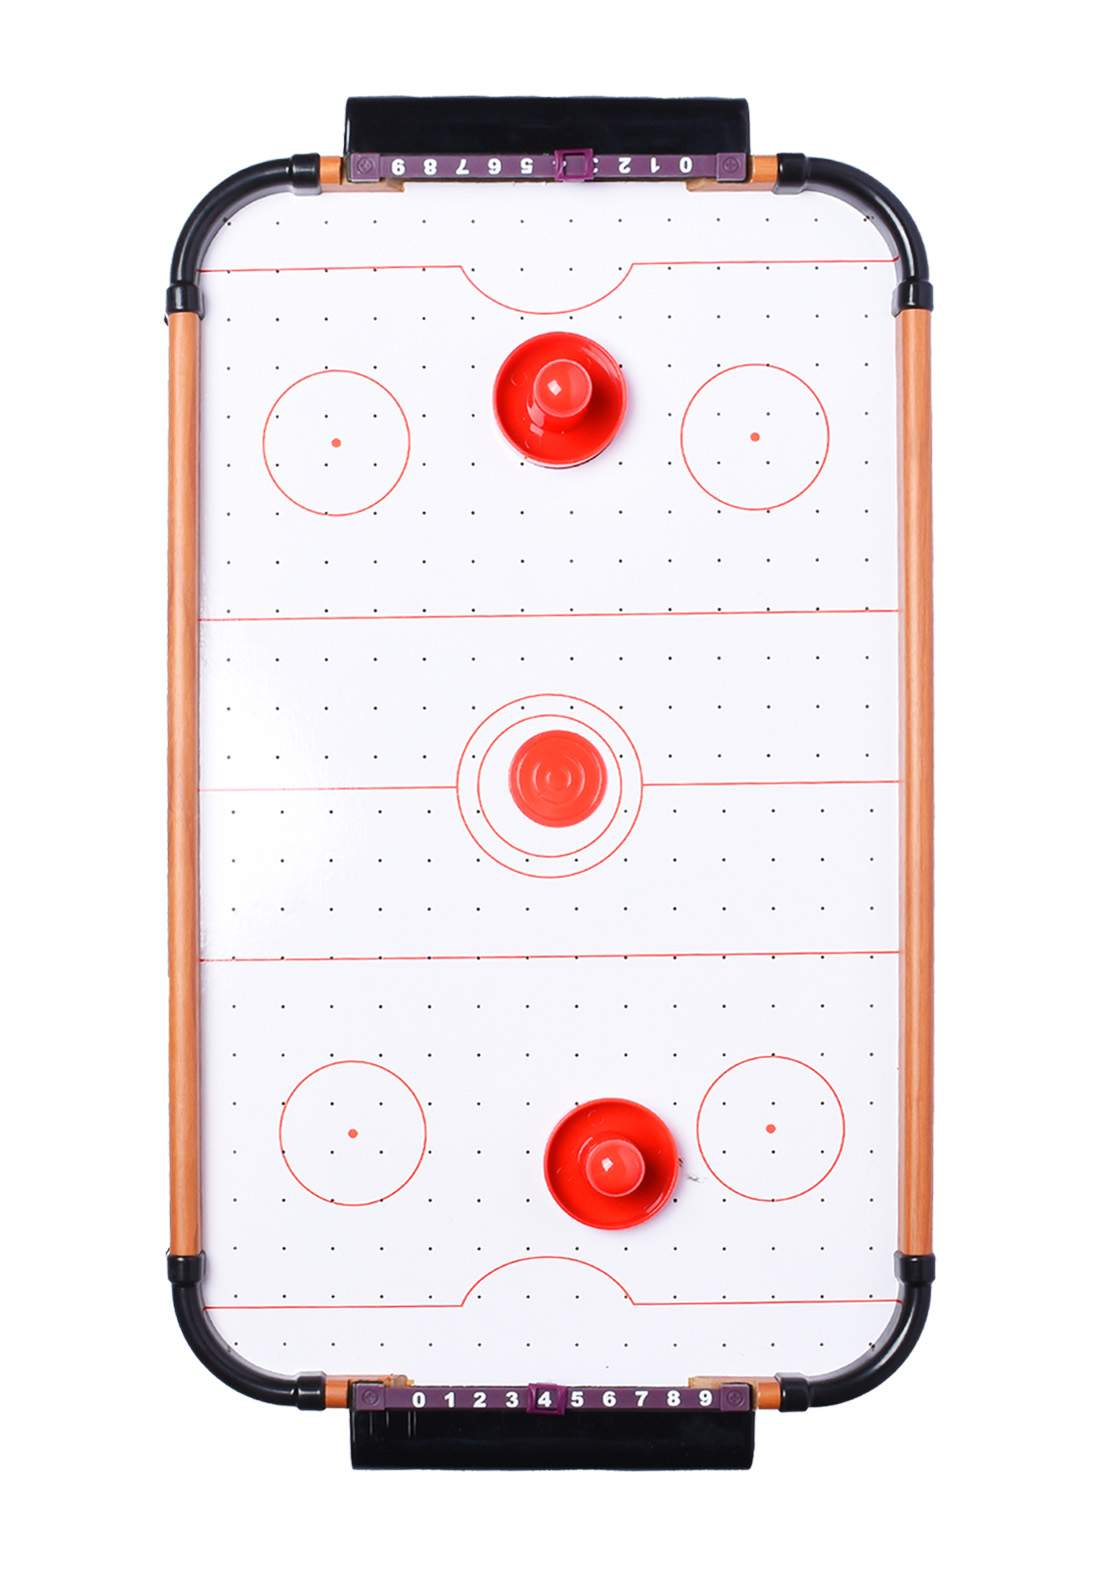 Air Hockey Table Game لعبة الهوكي المنضدية